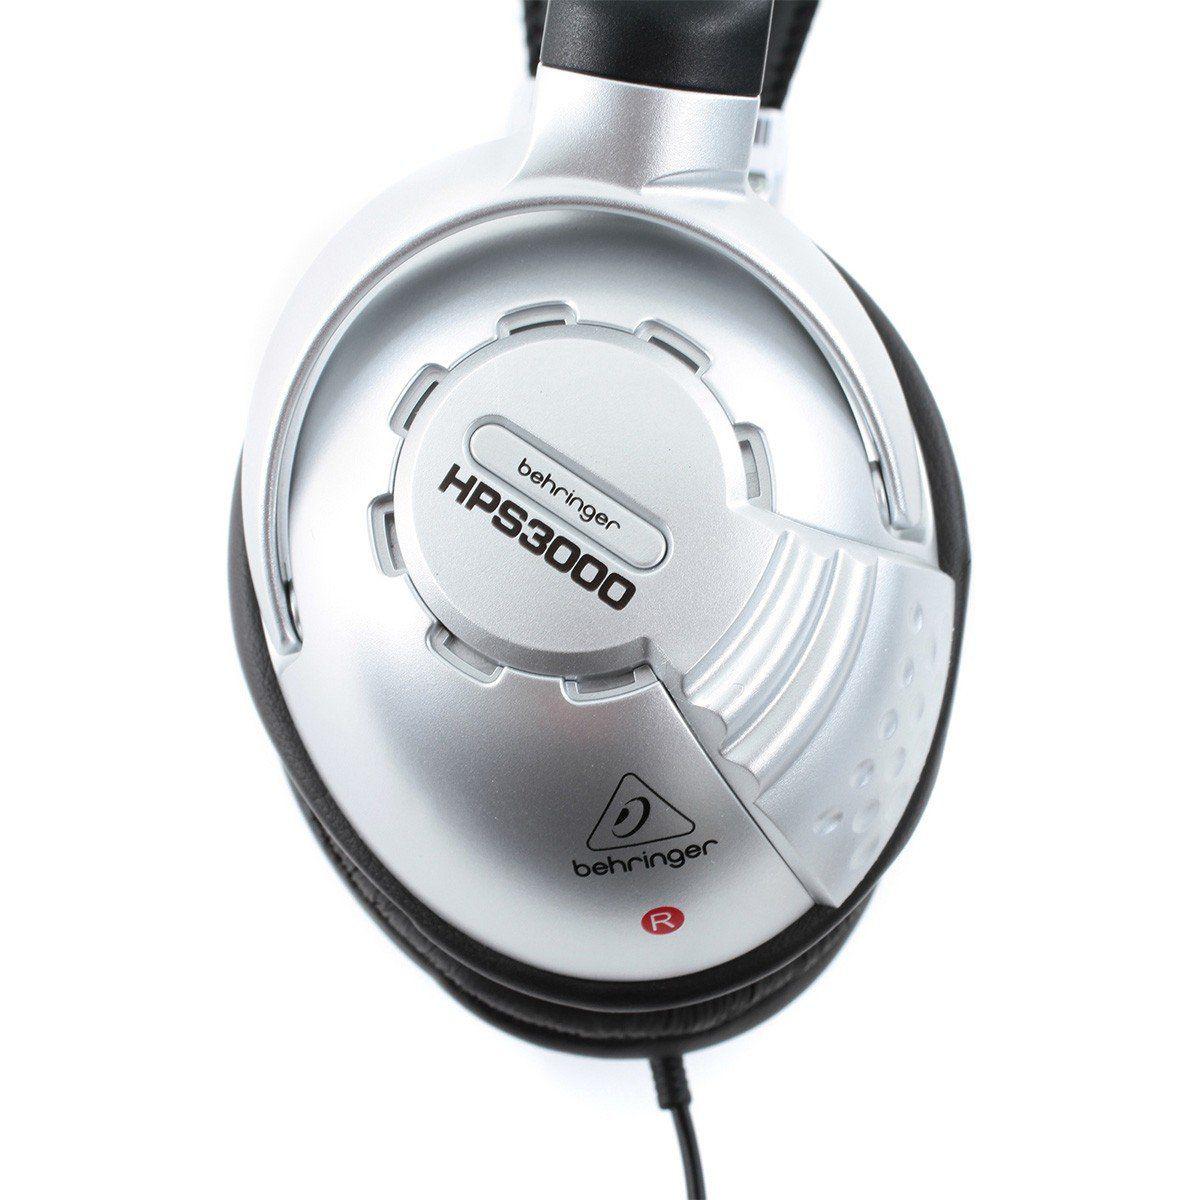 Behringer HPS3000 Fone de Ouvido HPS-3000 Semi-Aberto para Dj Profissional